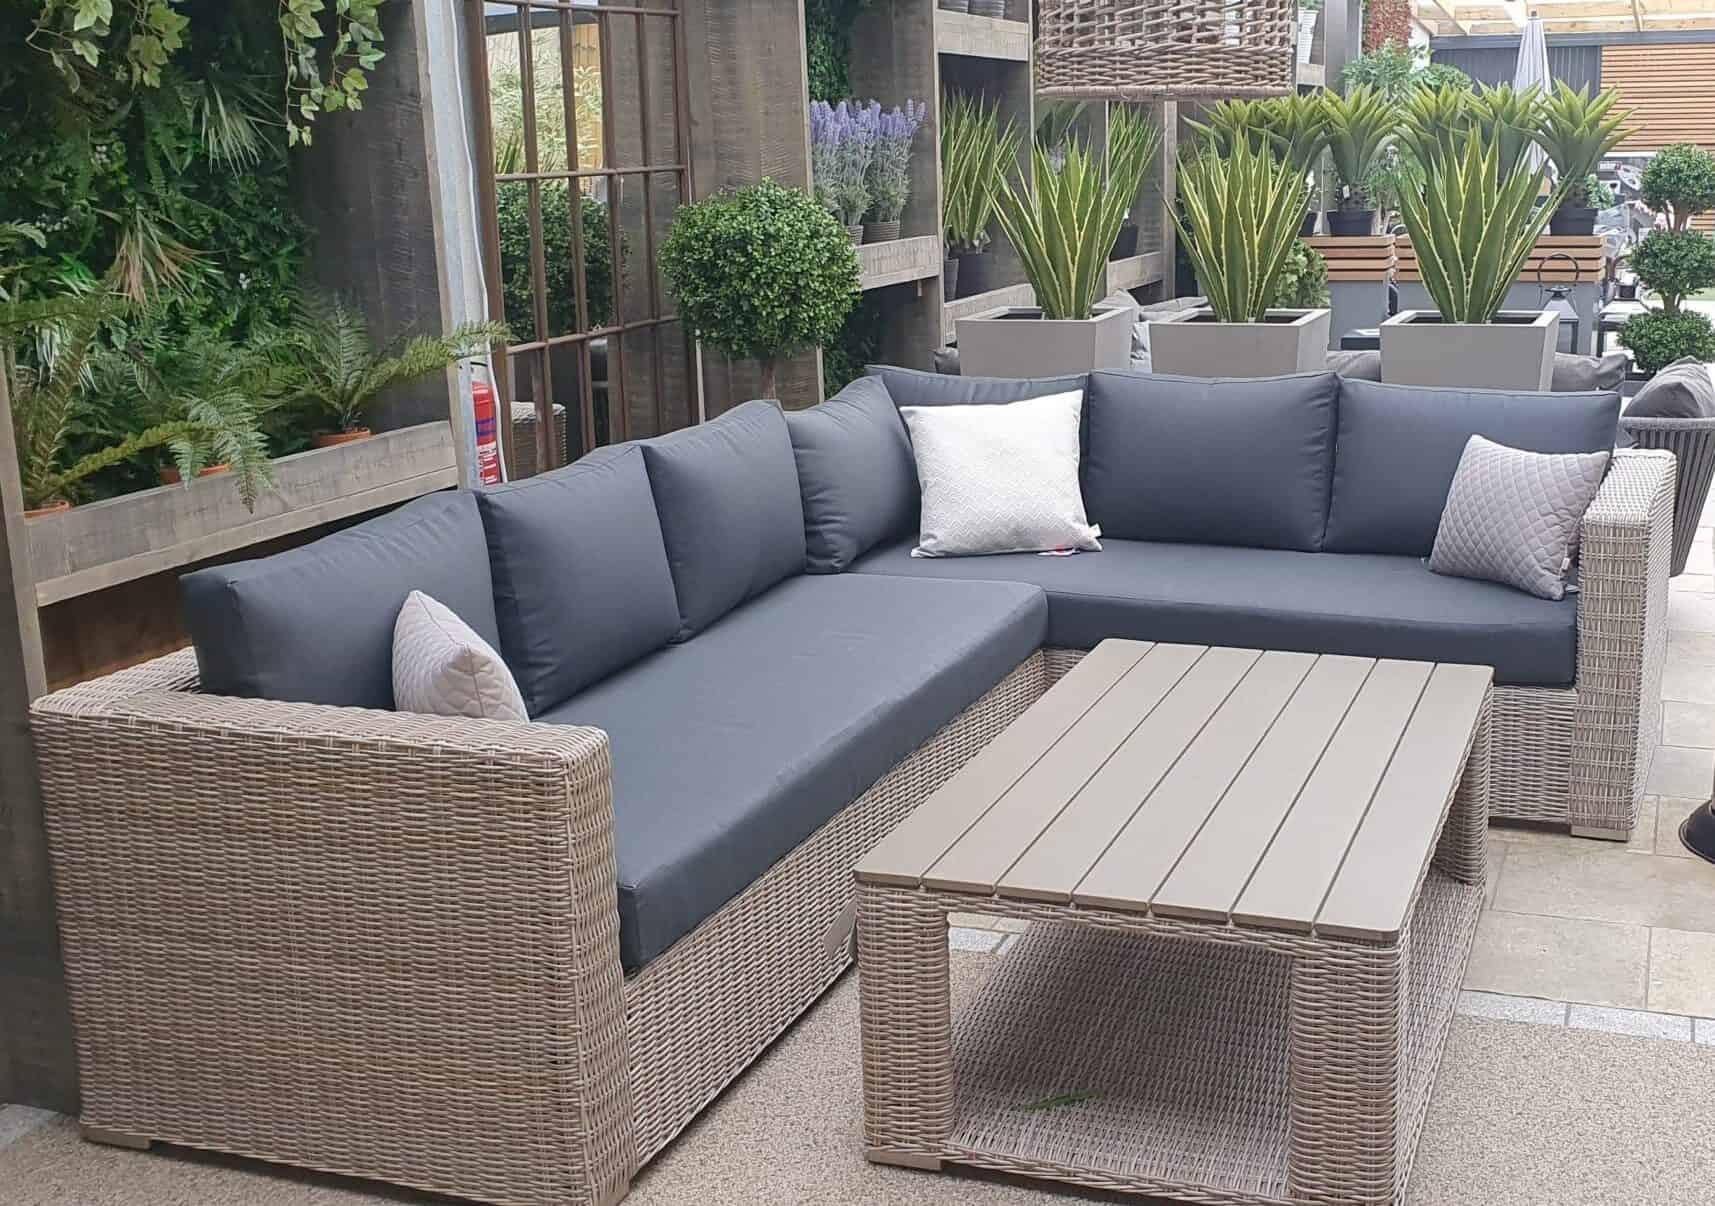 Valencia corner sofa - Outdoor Furniture For Sale Dublin Ireland